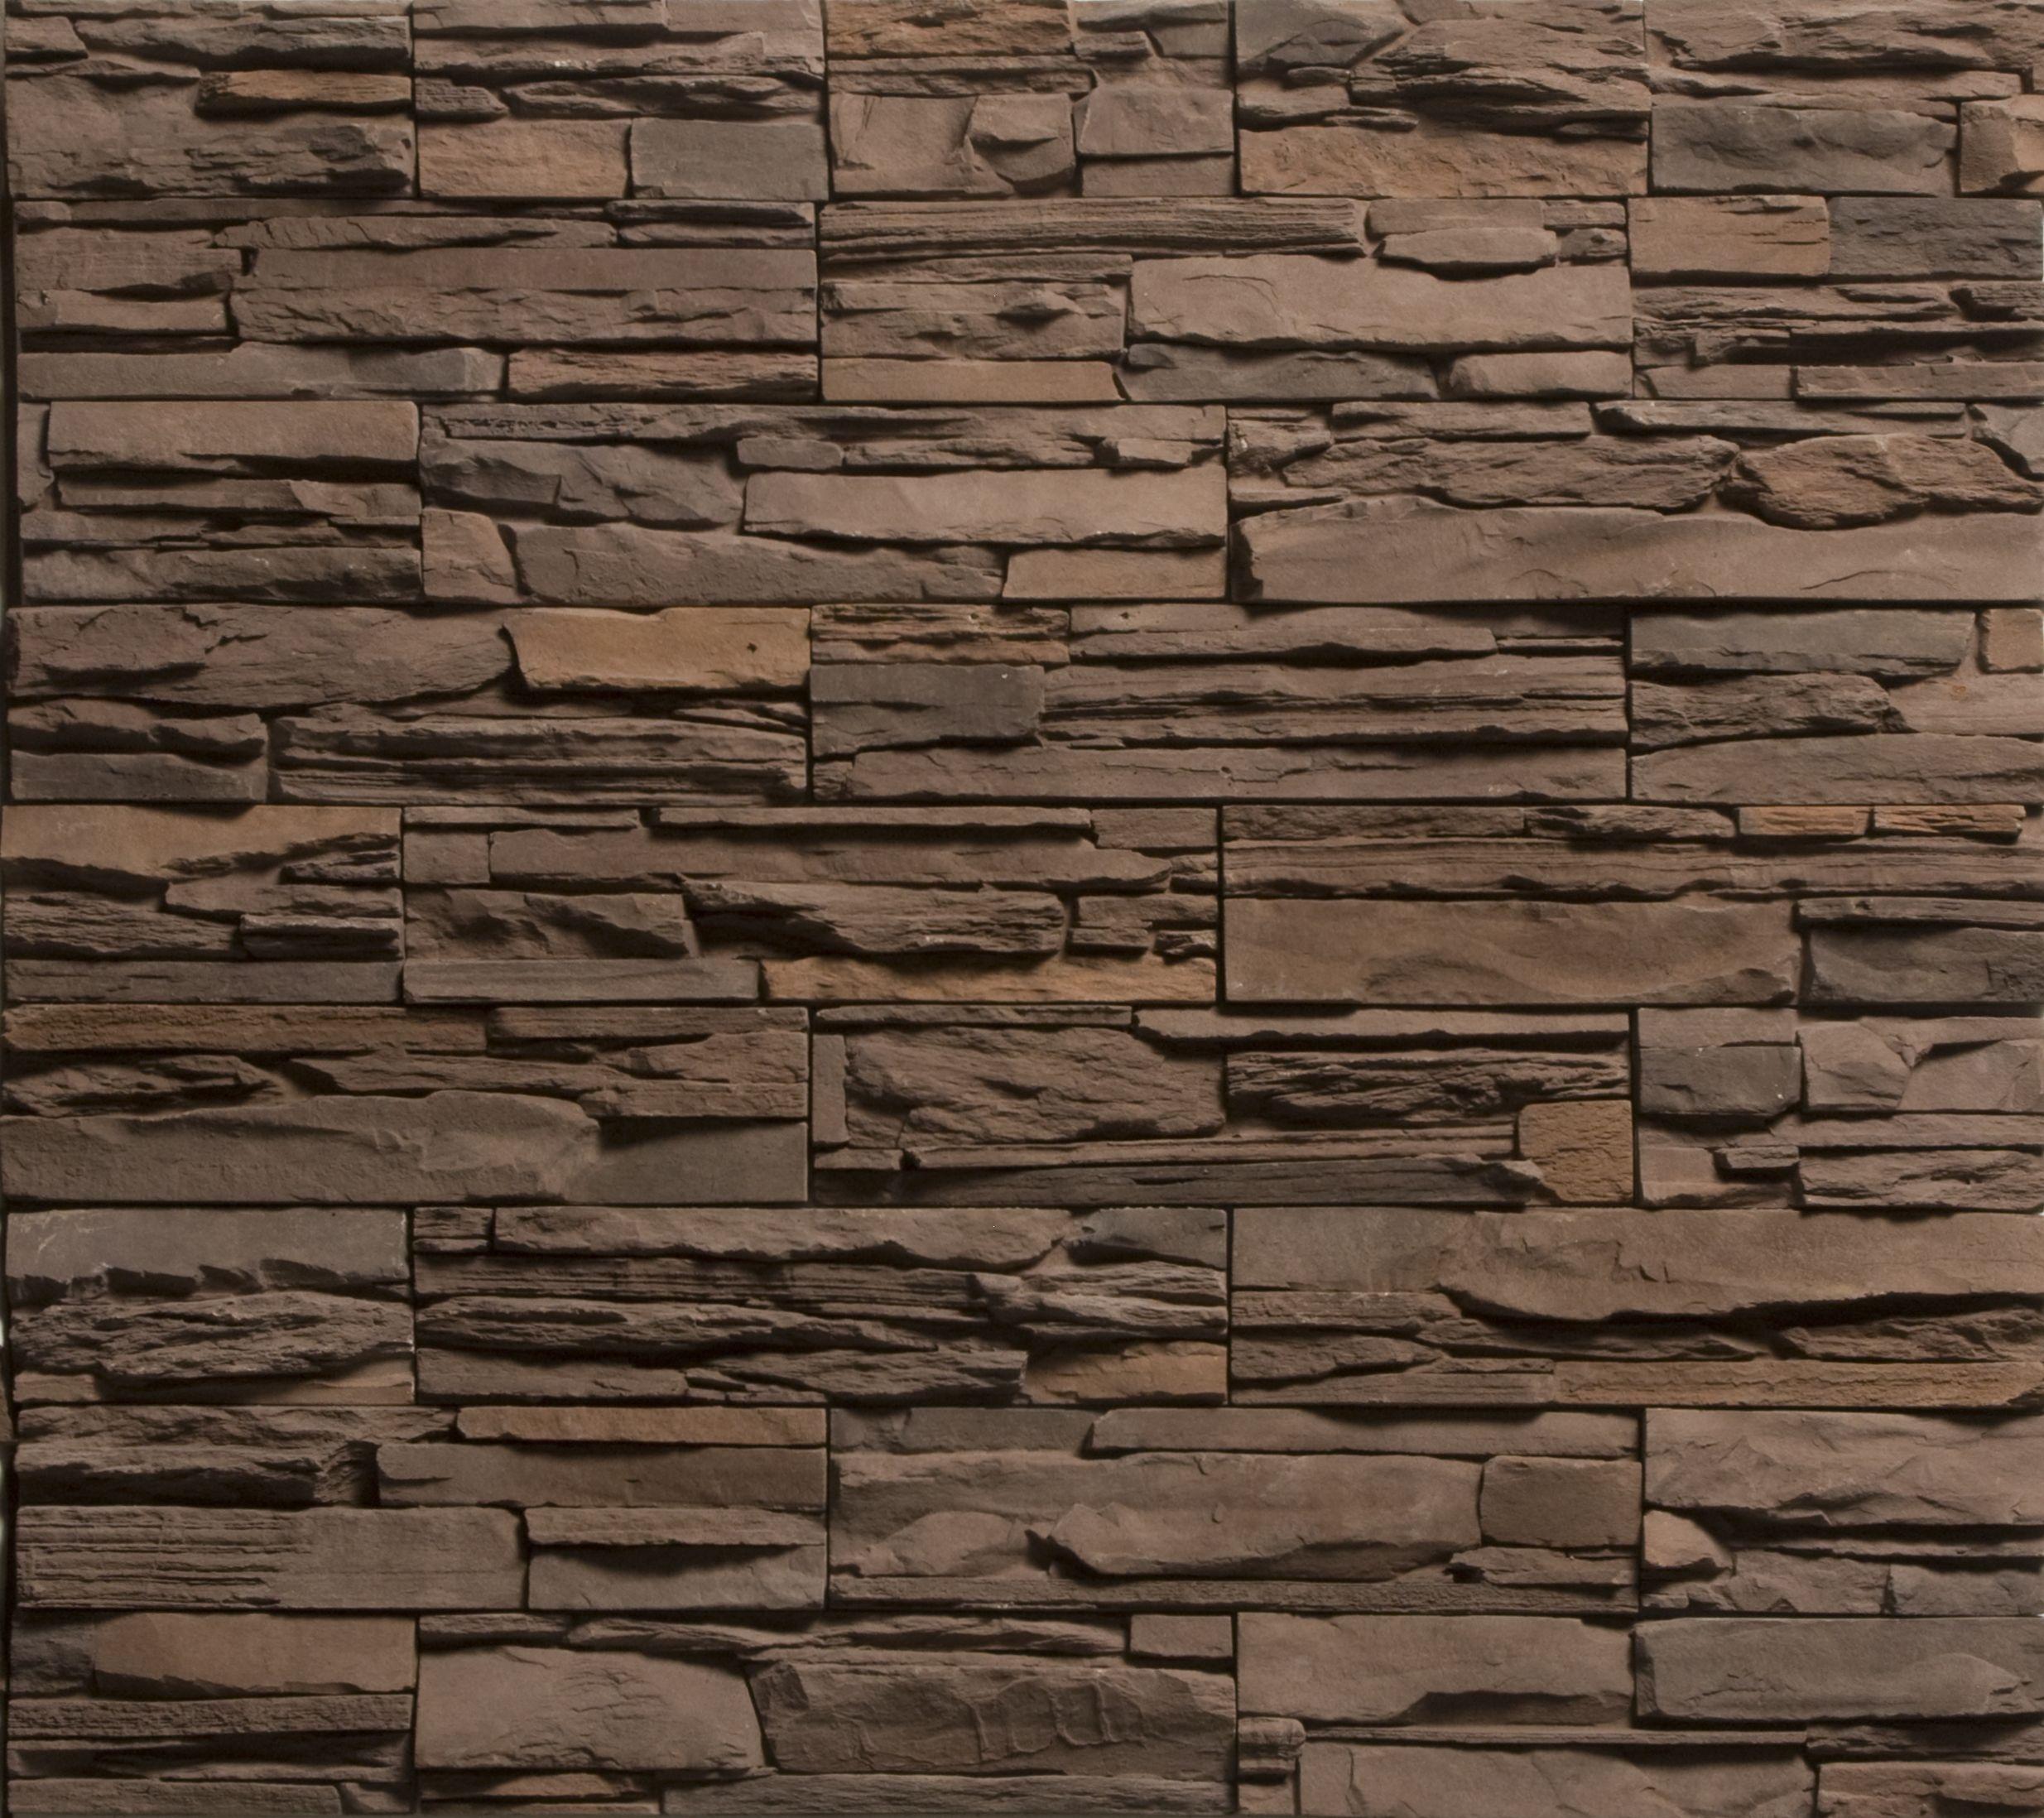 stone texture texture stone wall texture